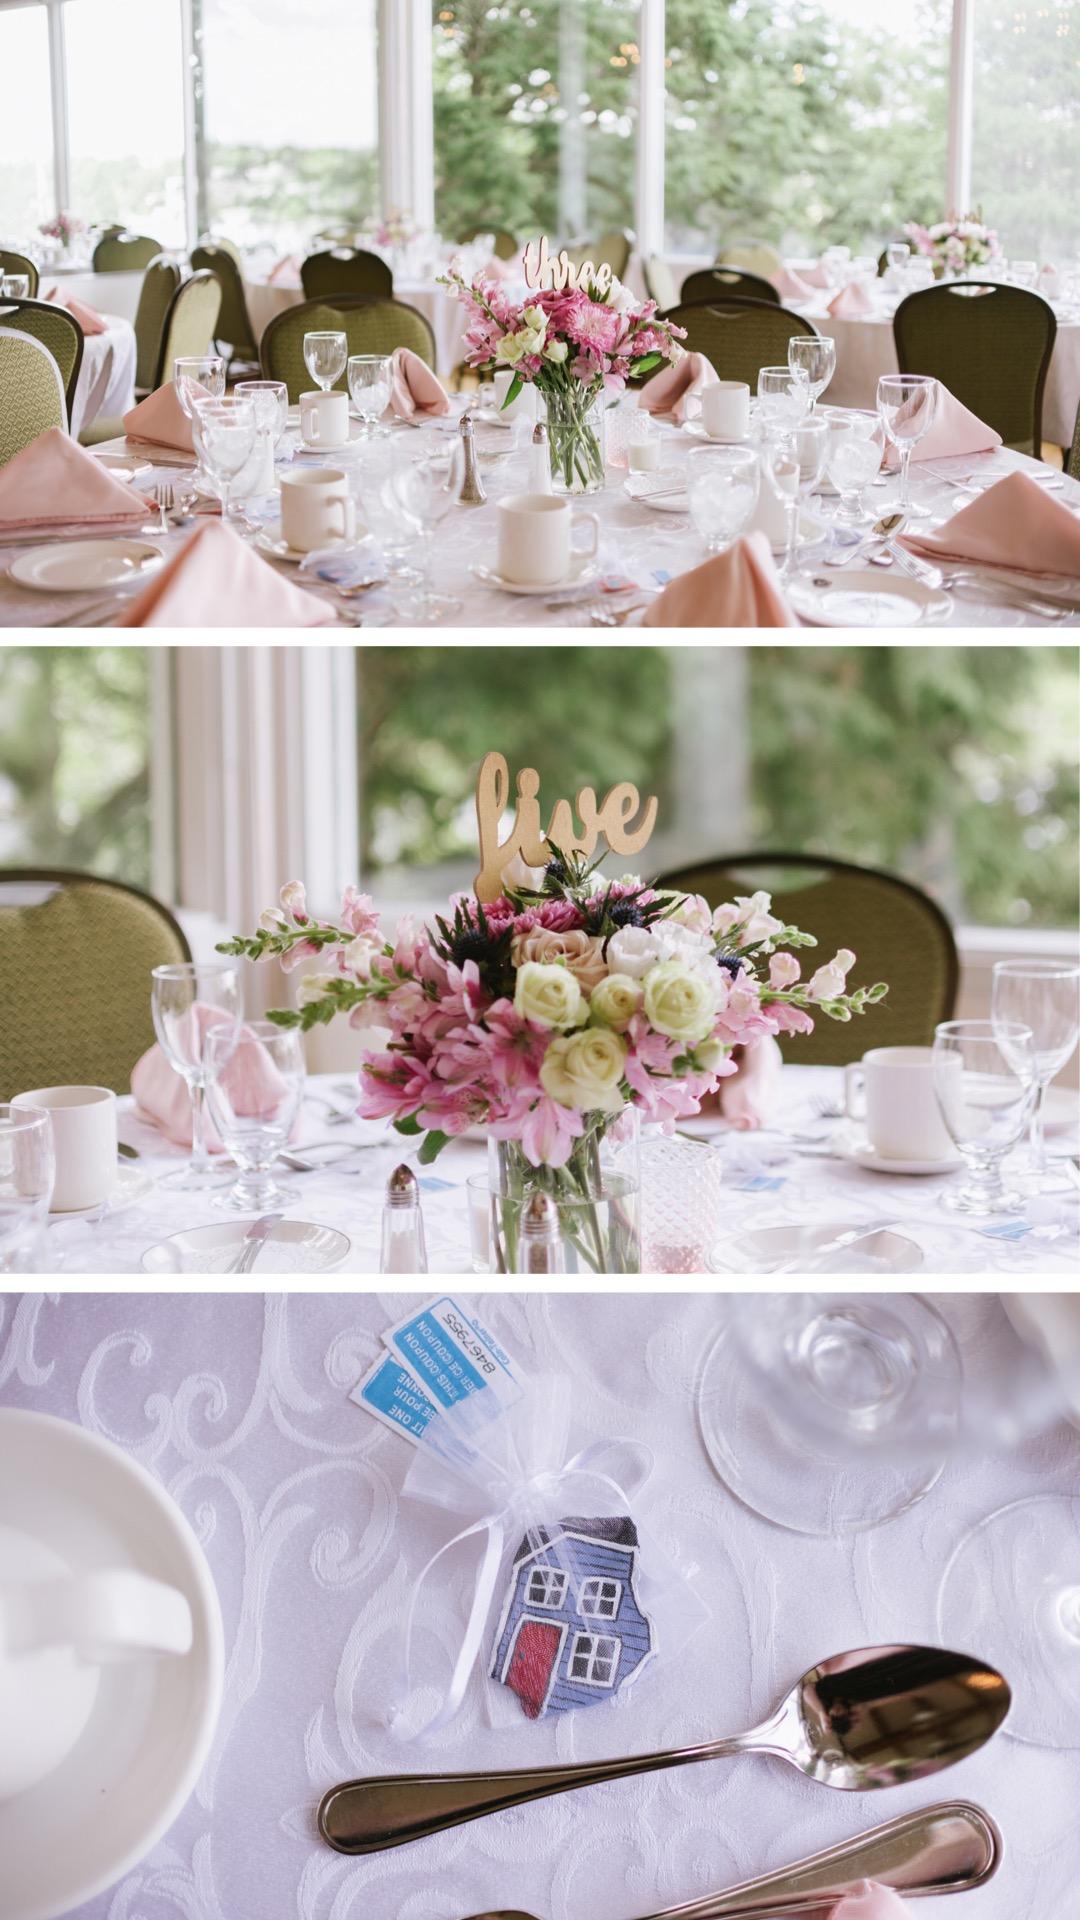 Martina & Scott Halifax Wedding Photographer - Sinead Dubeau Photography 20